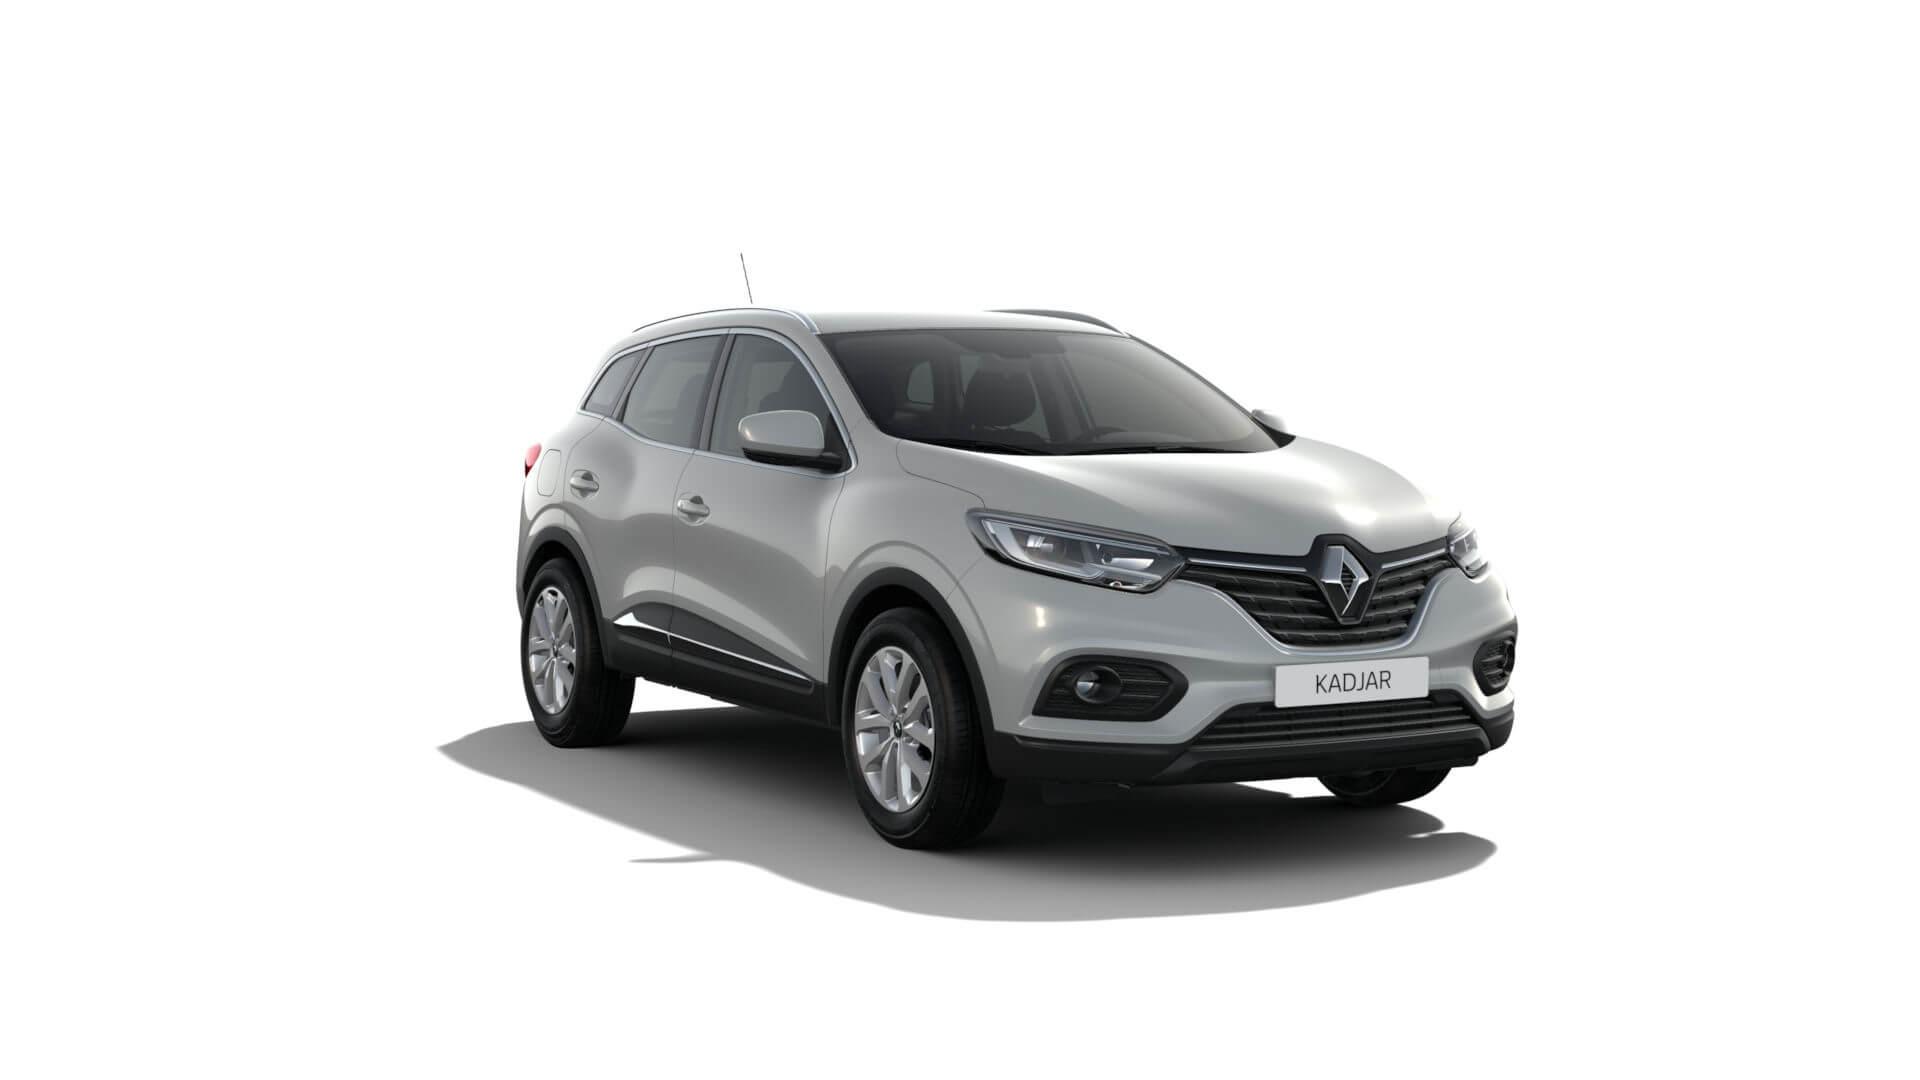 Automodell grau - Renault Kadjar - Renault Ahrens Hannover